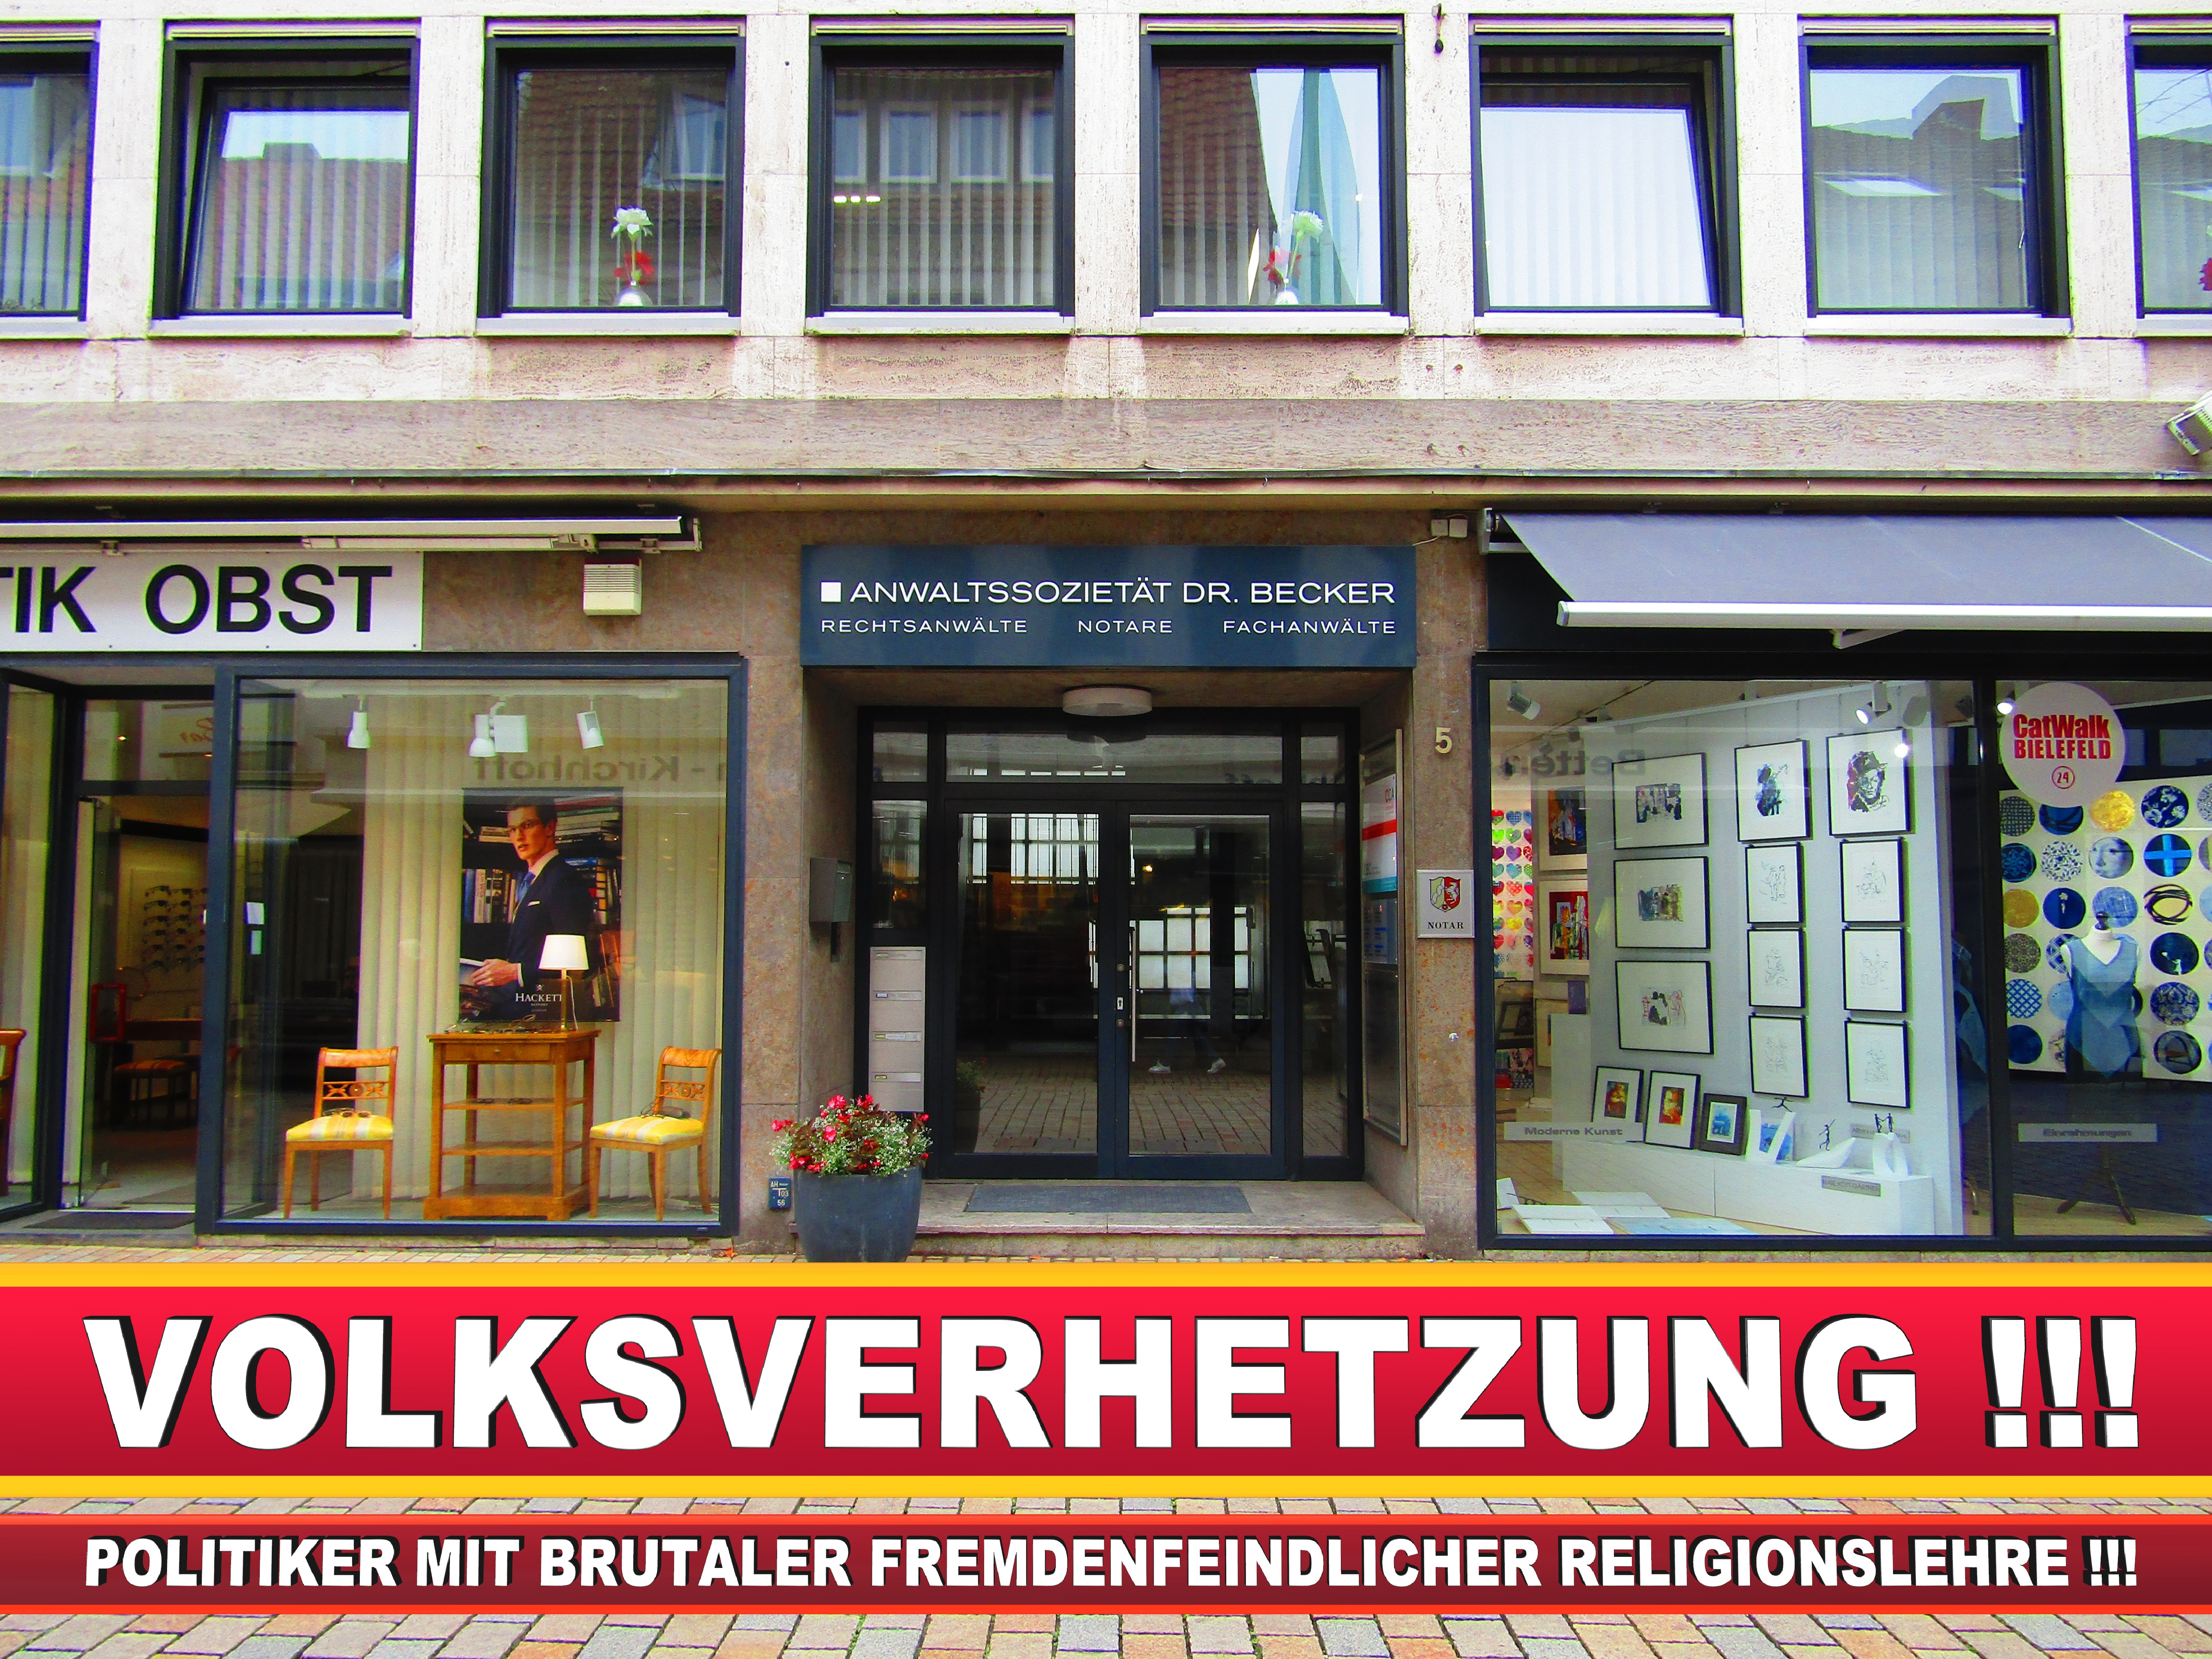 RECHTSANWALT DR THORSTEN FELDMANN CDU BIELEFELD Rechtsanwalt Und Notar A D Werner Kaup (3) LANDTAGSWAHL BUNDESTAGSWAHL BÜRGERMEISTERWAHL